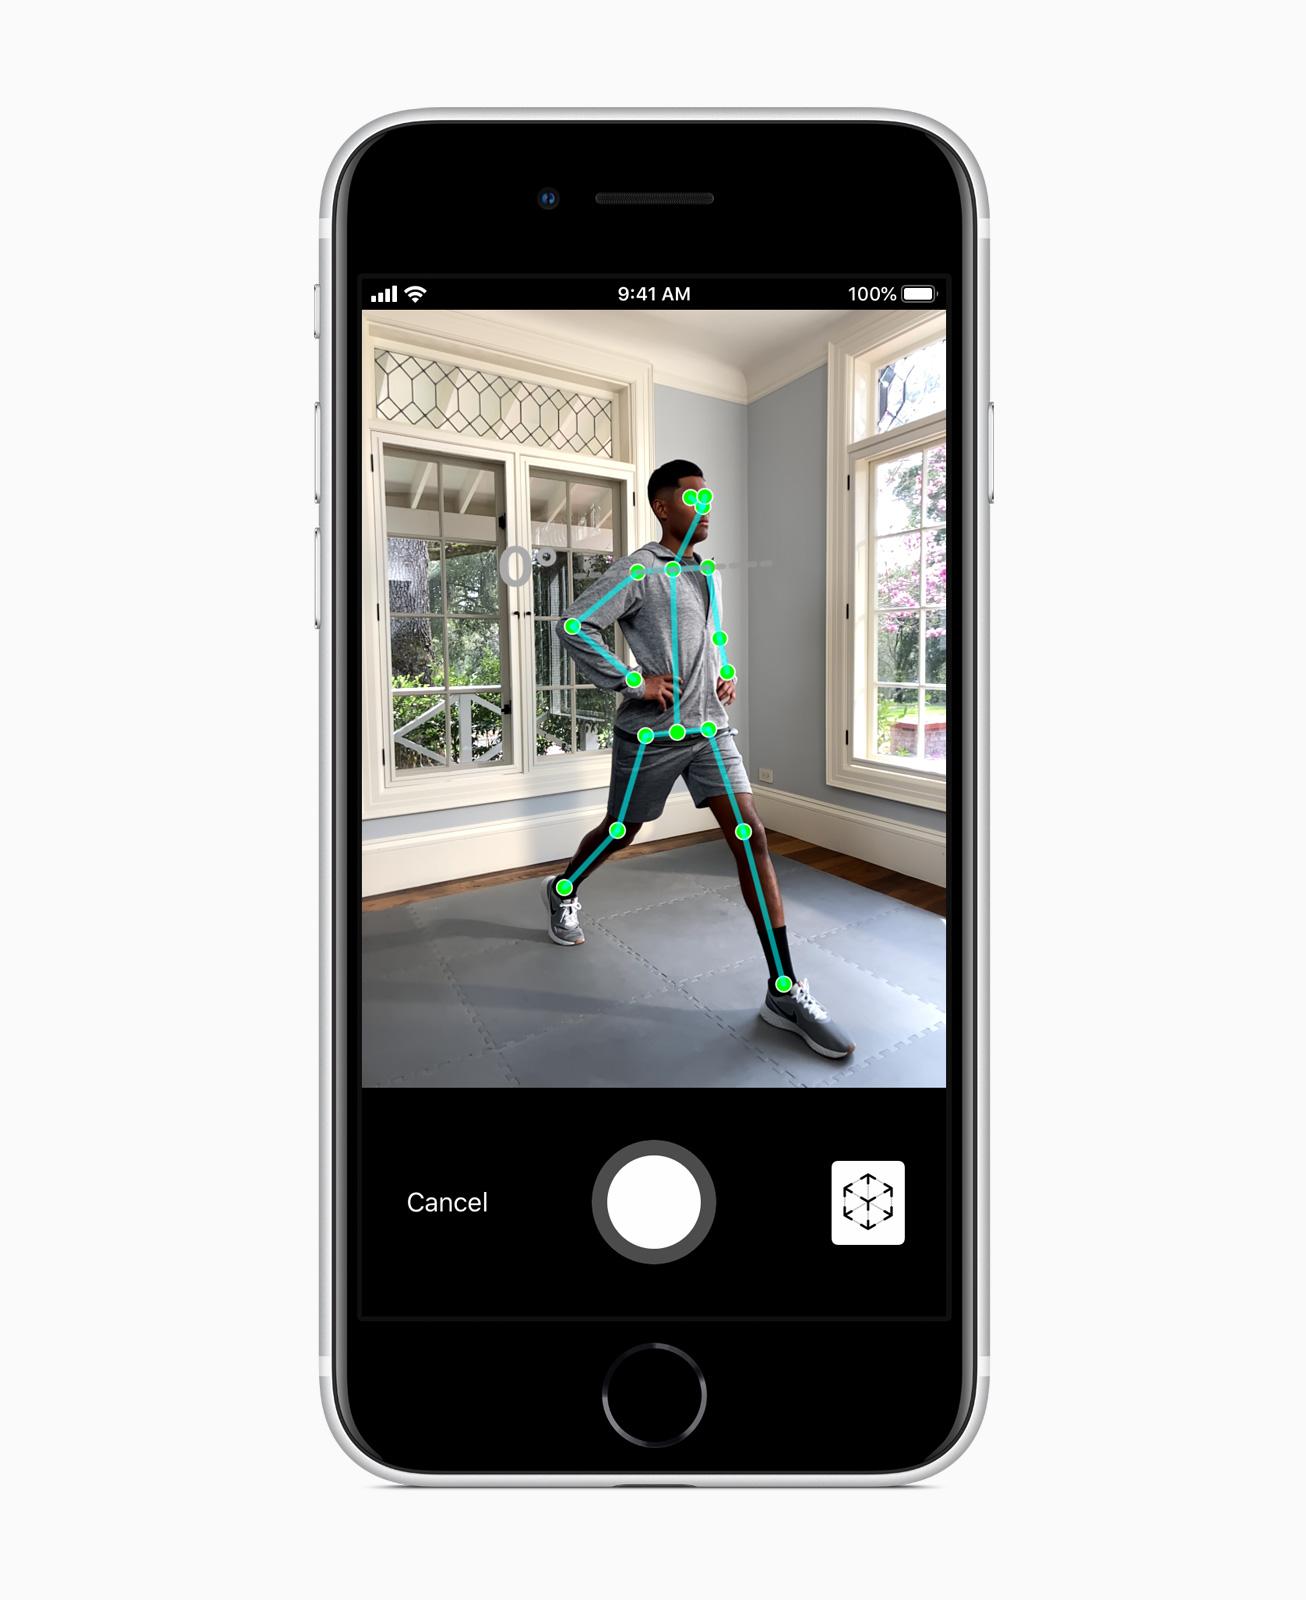 IPhone SE Plus To Have A Side Fingerprint Recognition Module